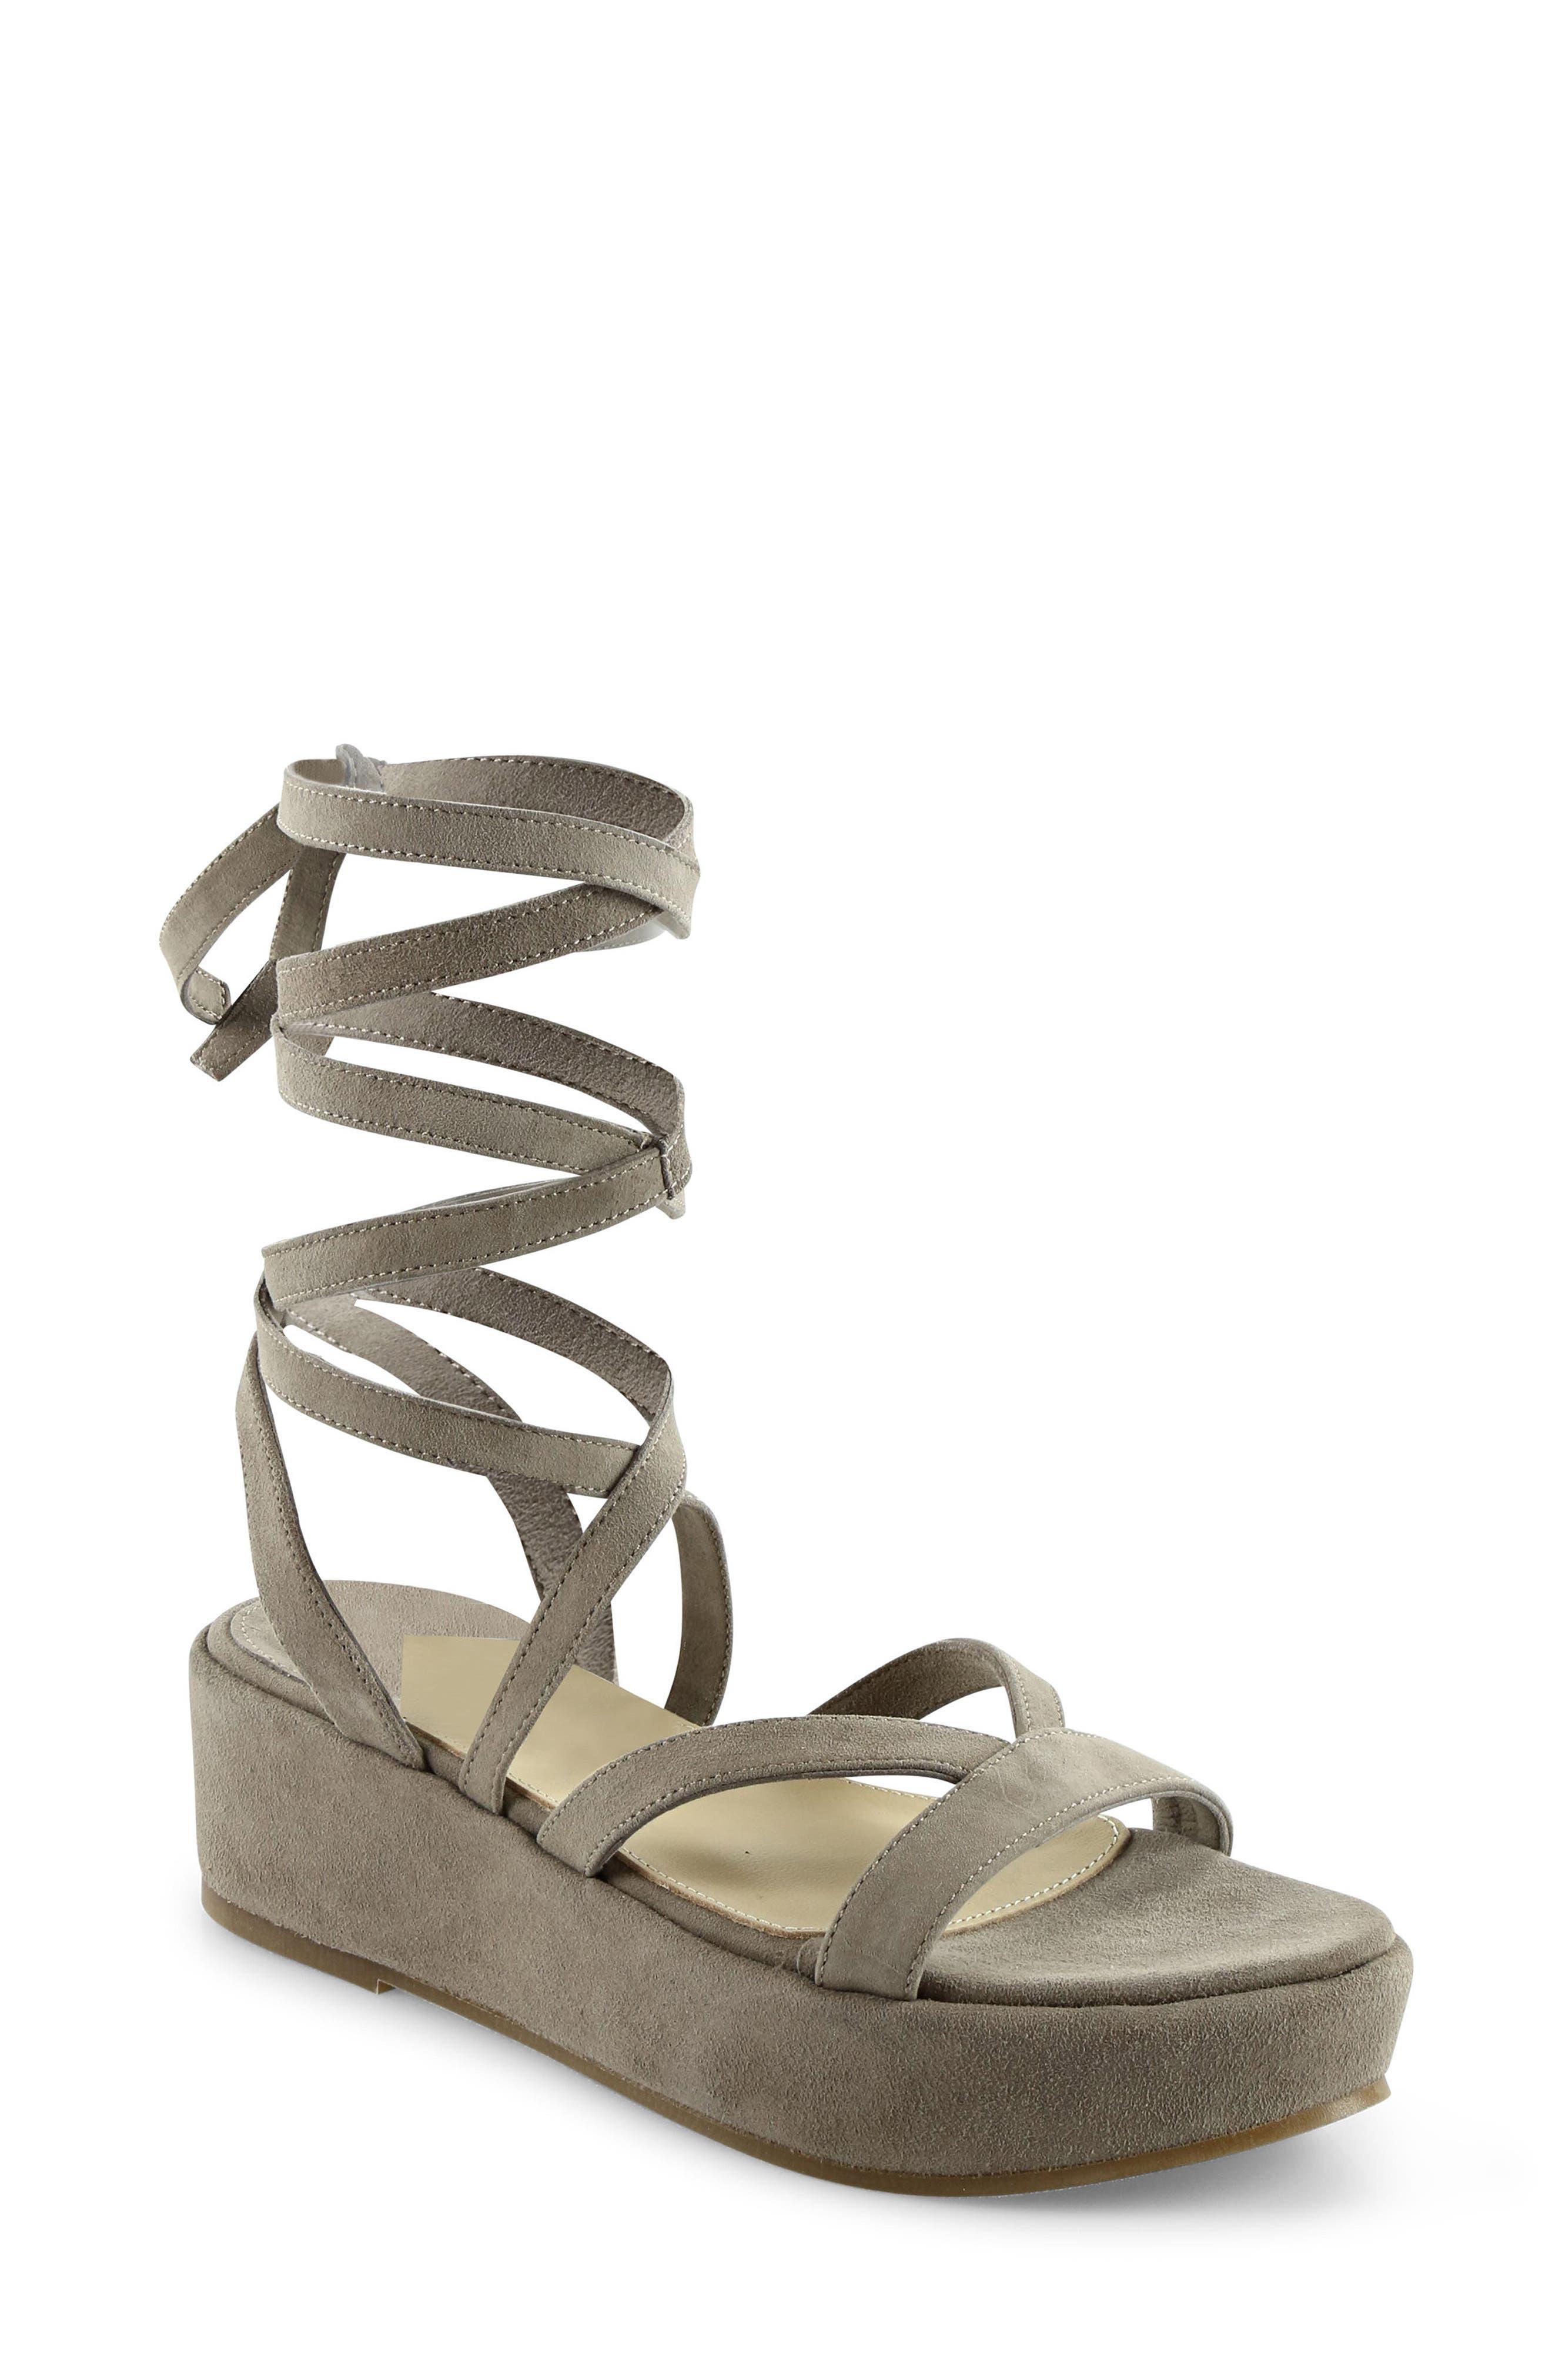 Keri Gladiator Platform Sandal,                             Main thumbnail 1, color,                             Camel Suede